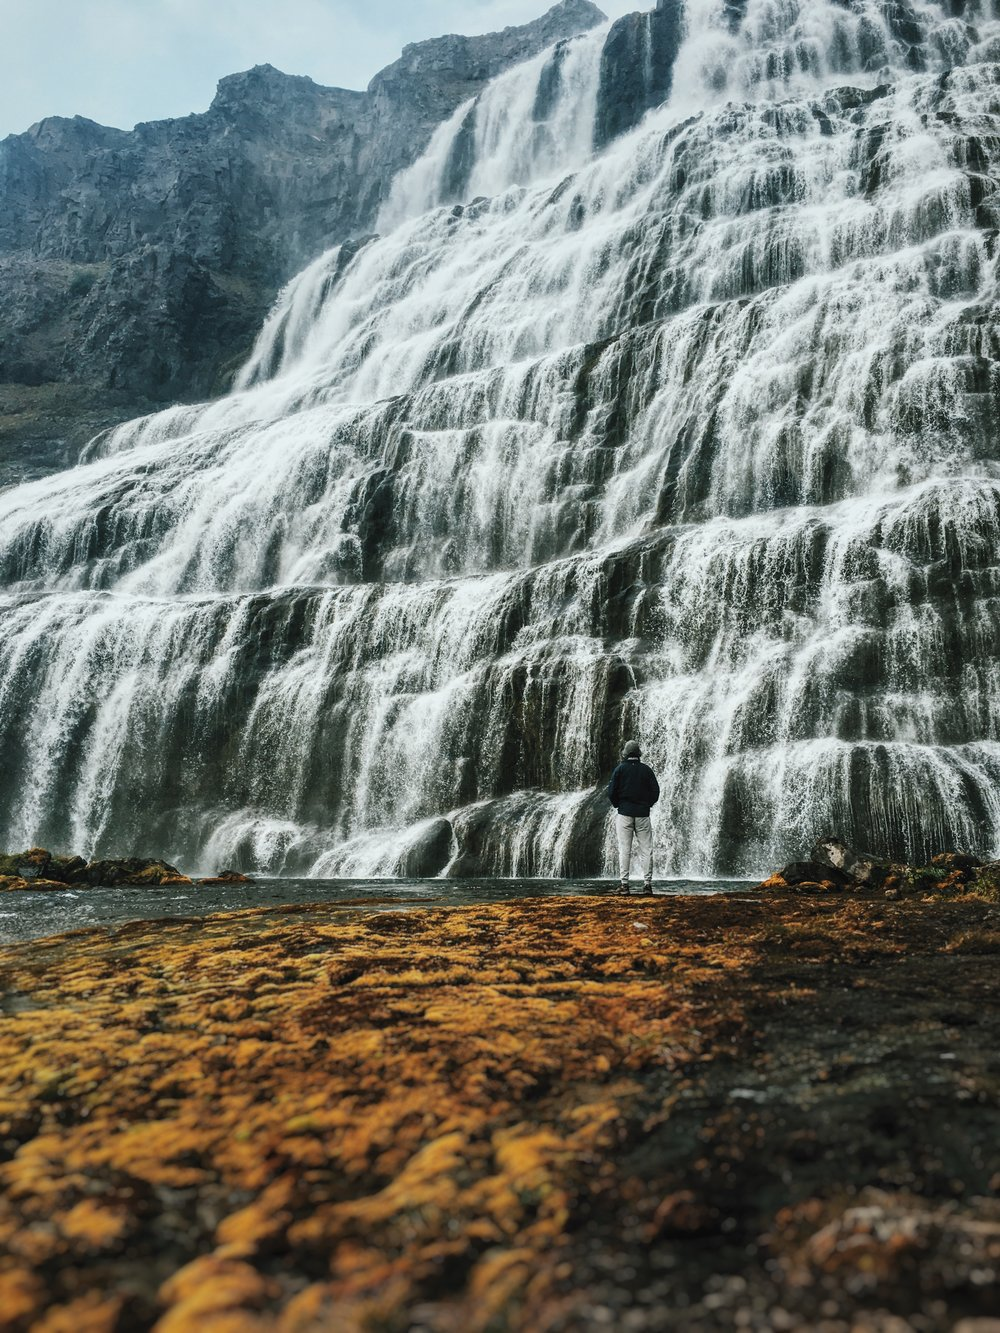 Dynjandi, Iceland, Chasing Waterfalls, Health